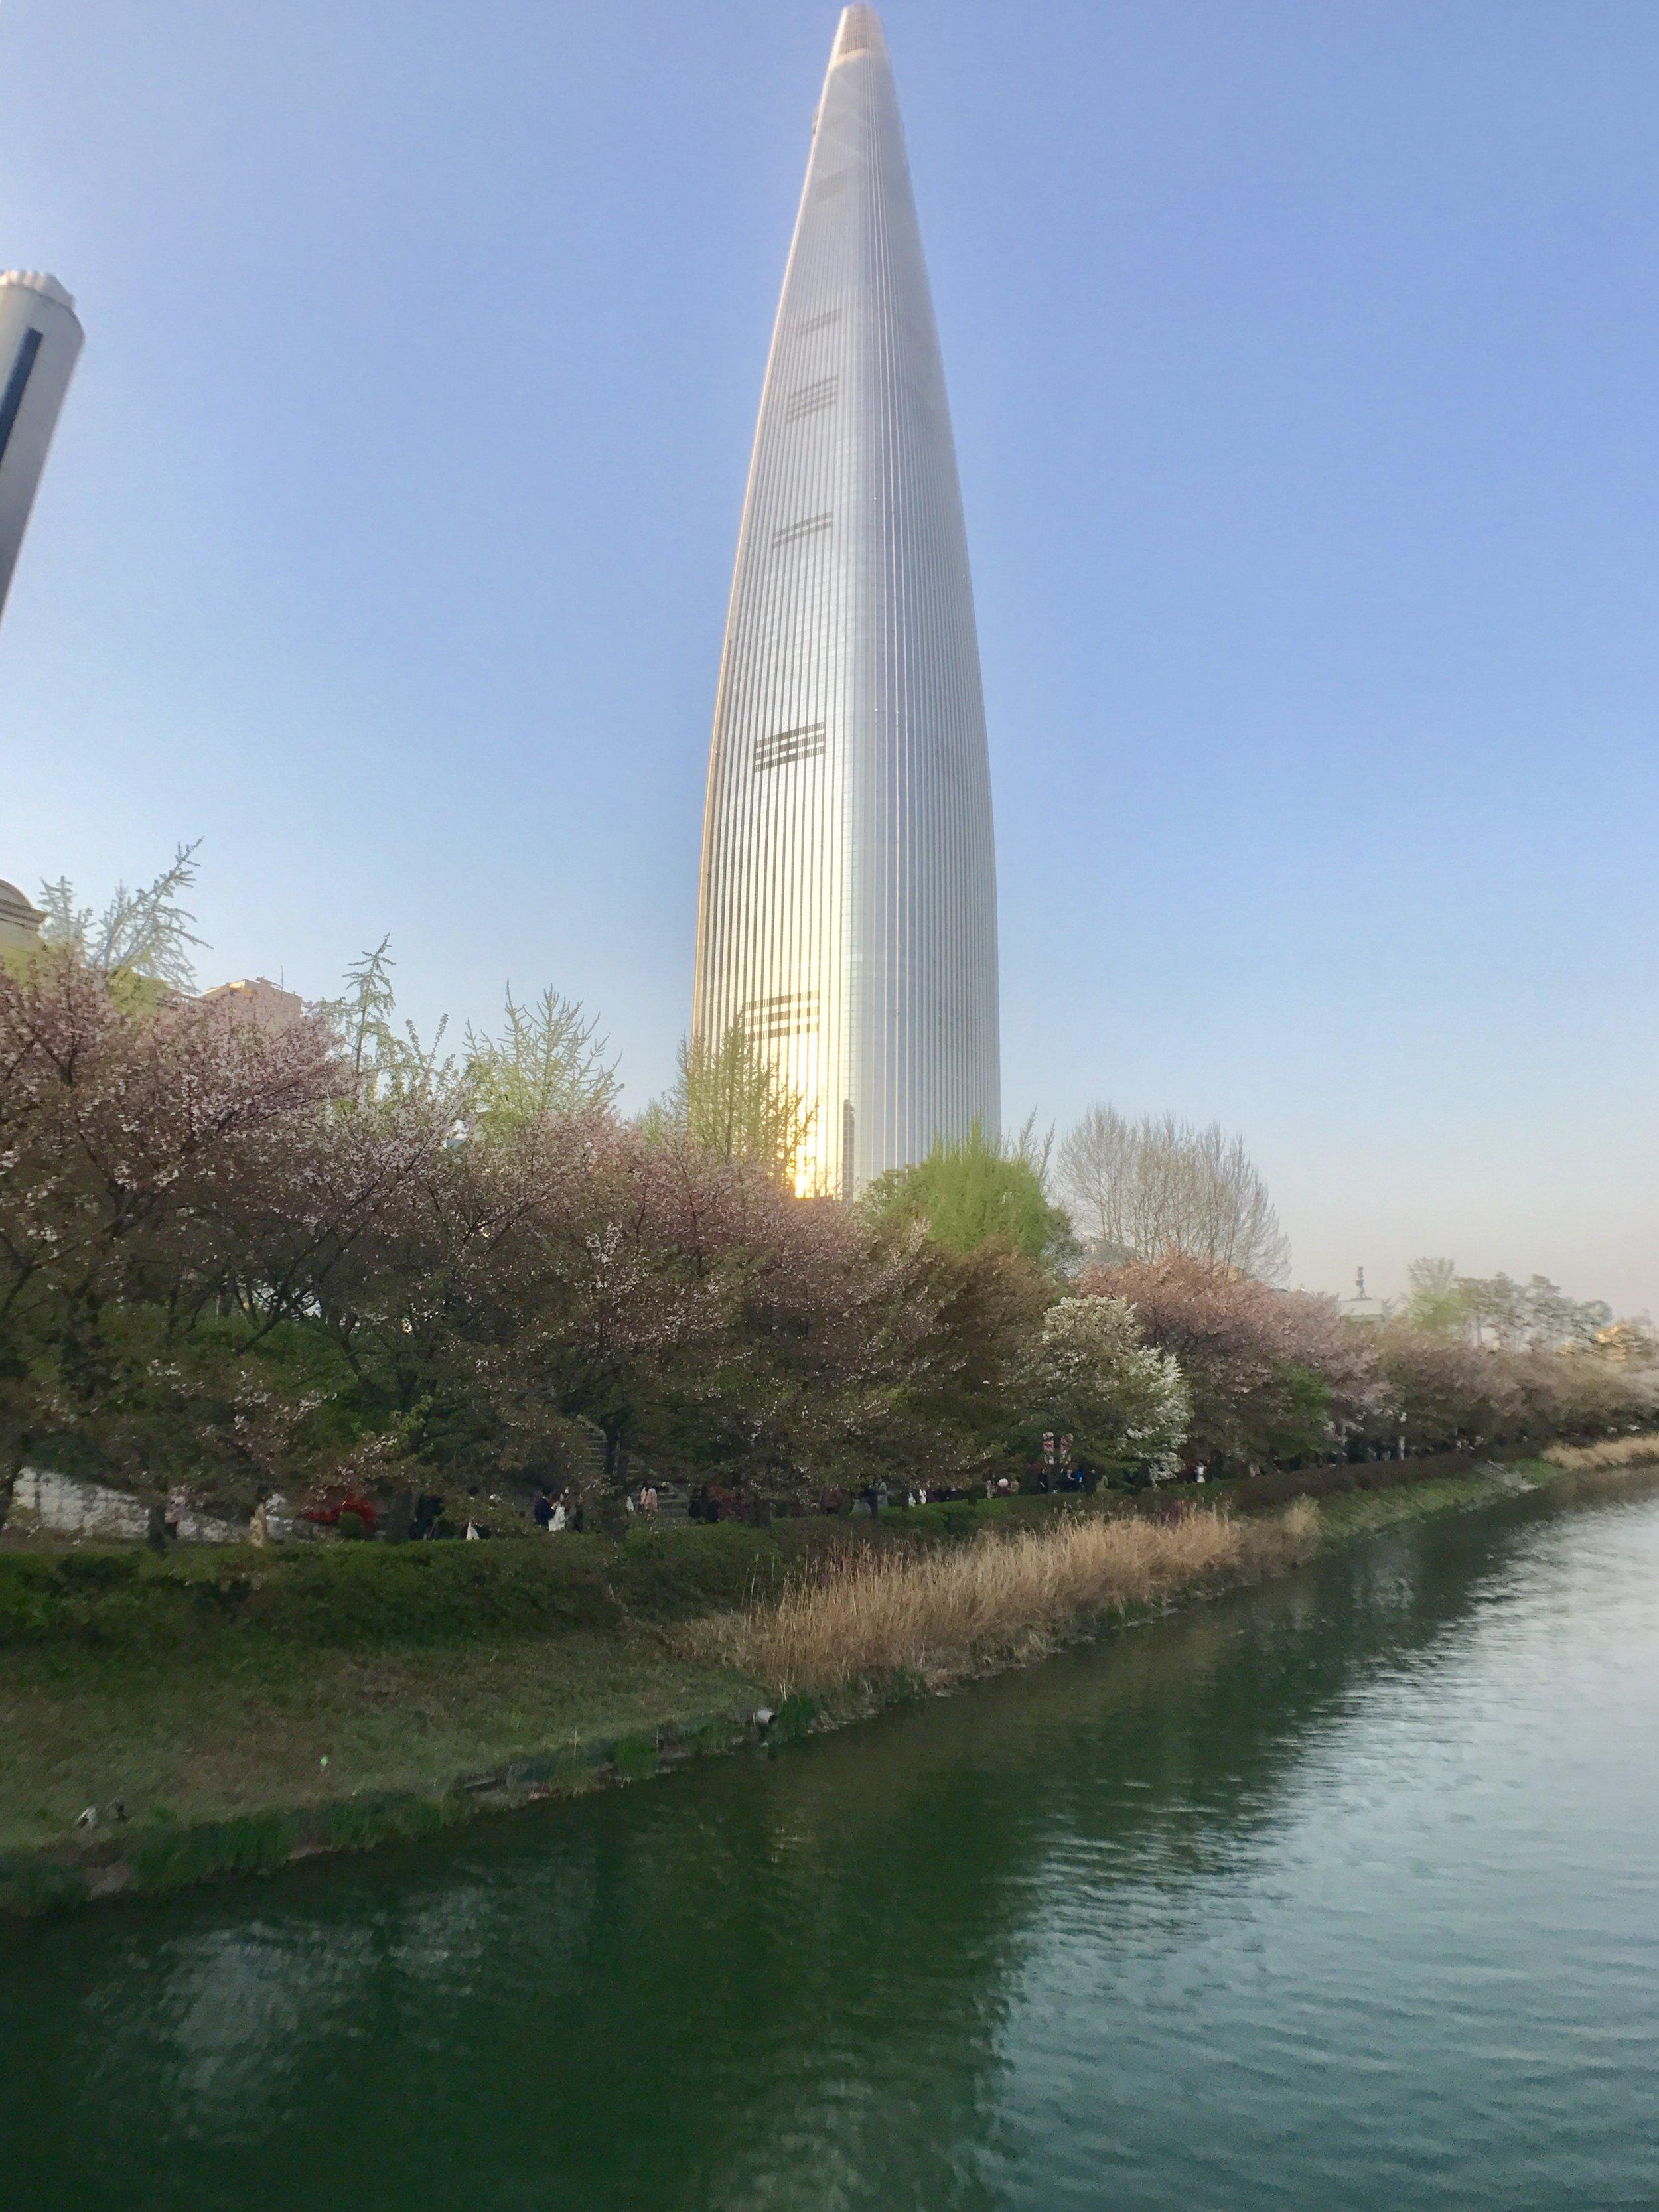 Lotte World Sky Tower